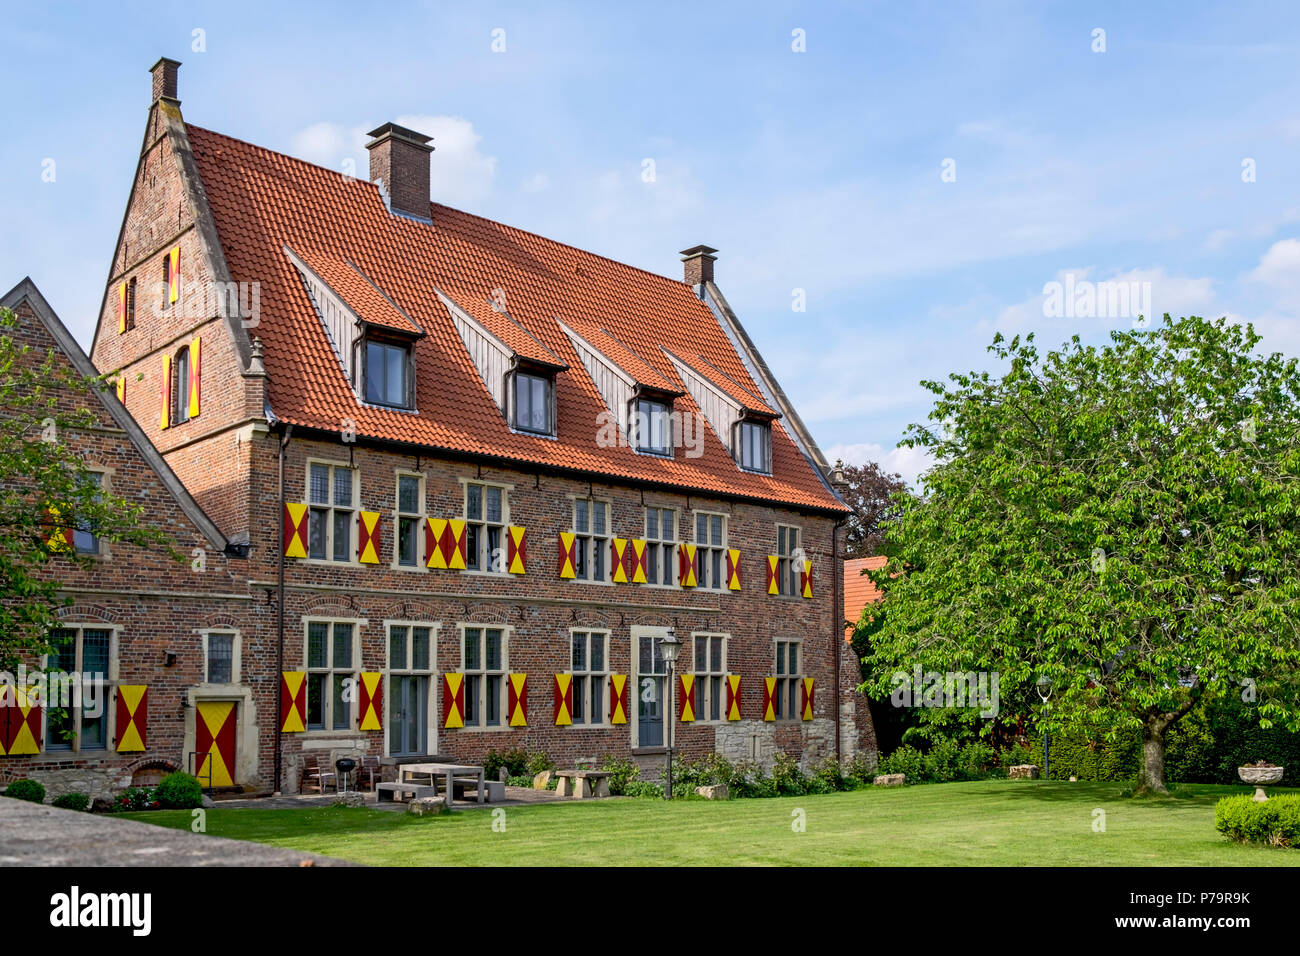 Münsterhof, Historischer Burgmannshof, Horstmar, Münsterland, North Rhine-Westphalia, Germany Stock Photo